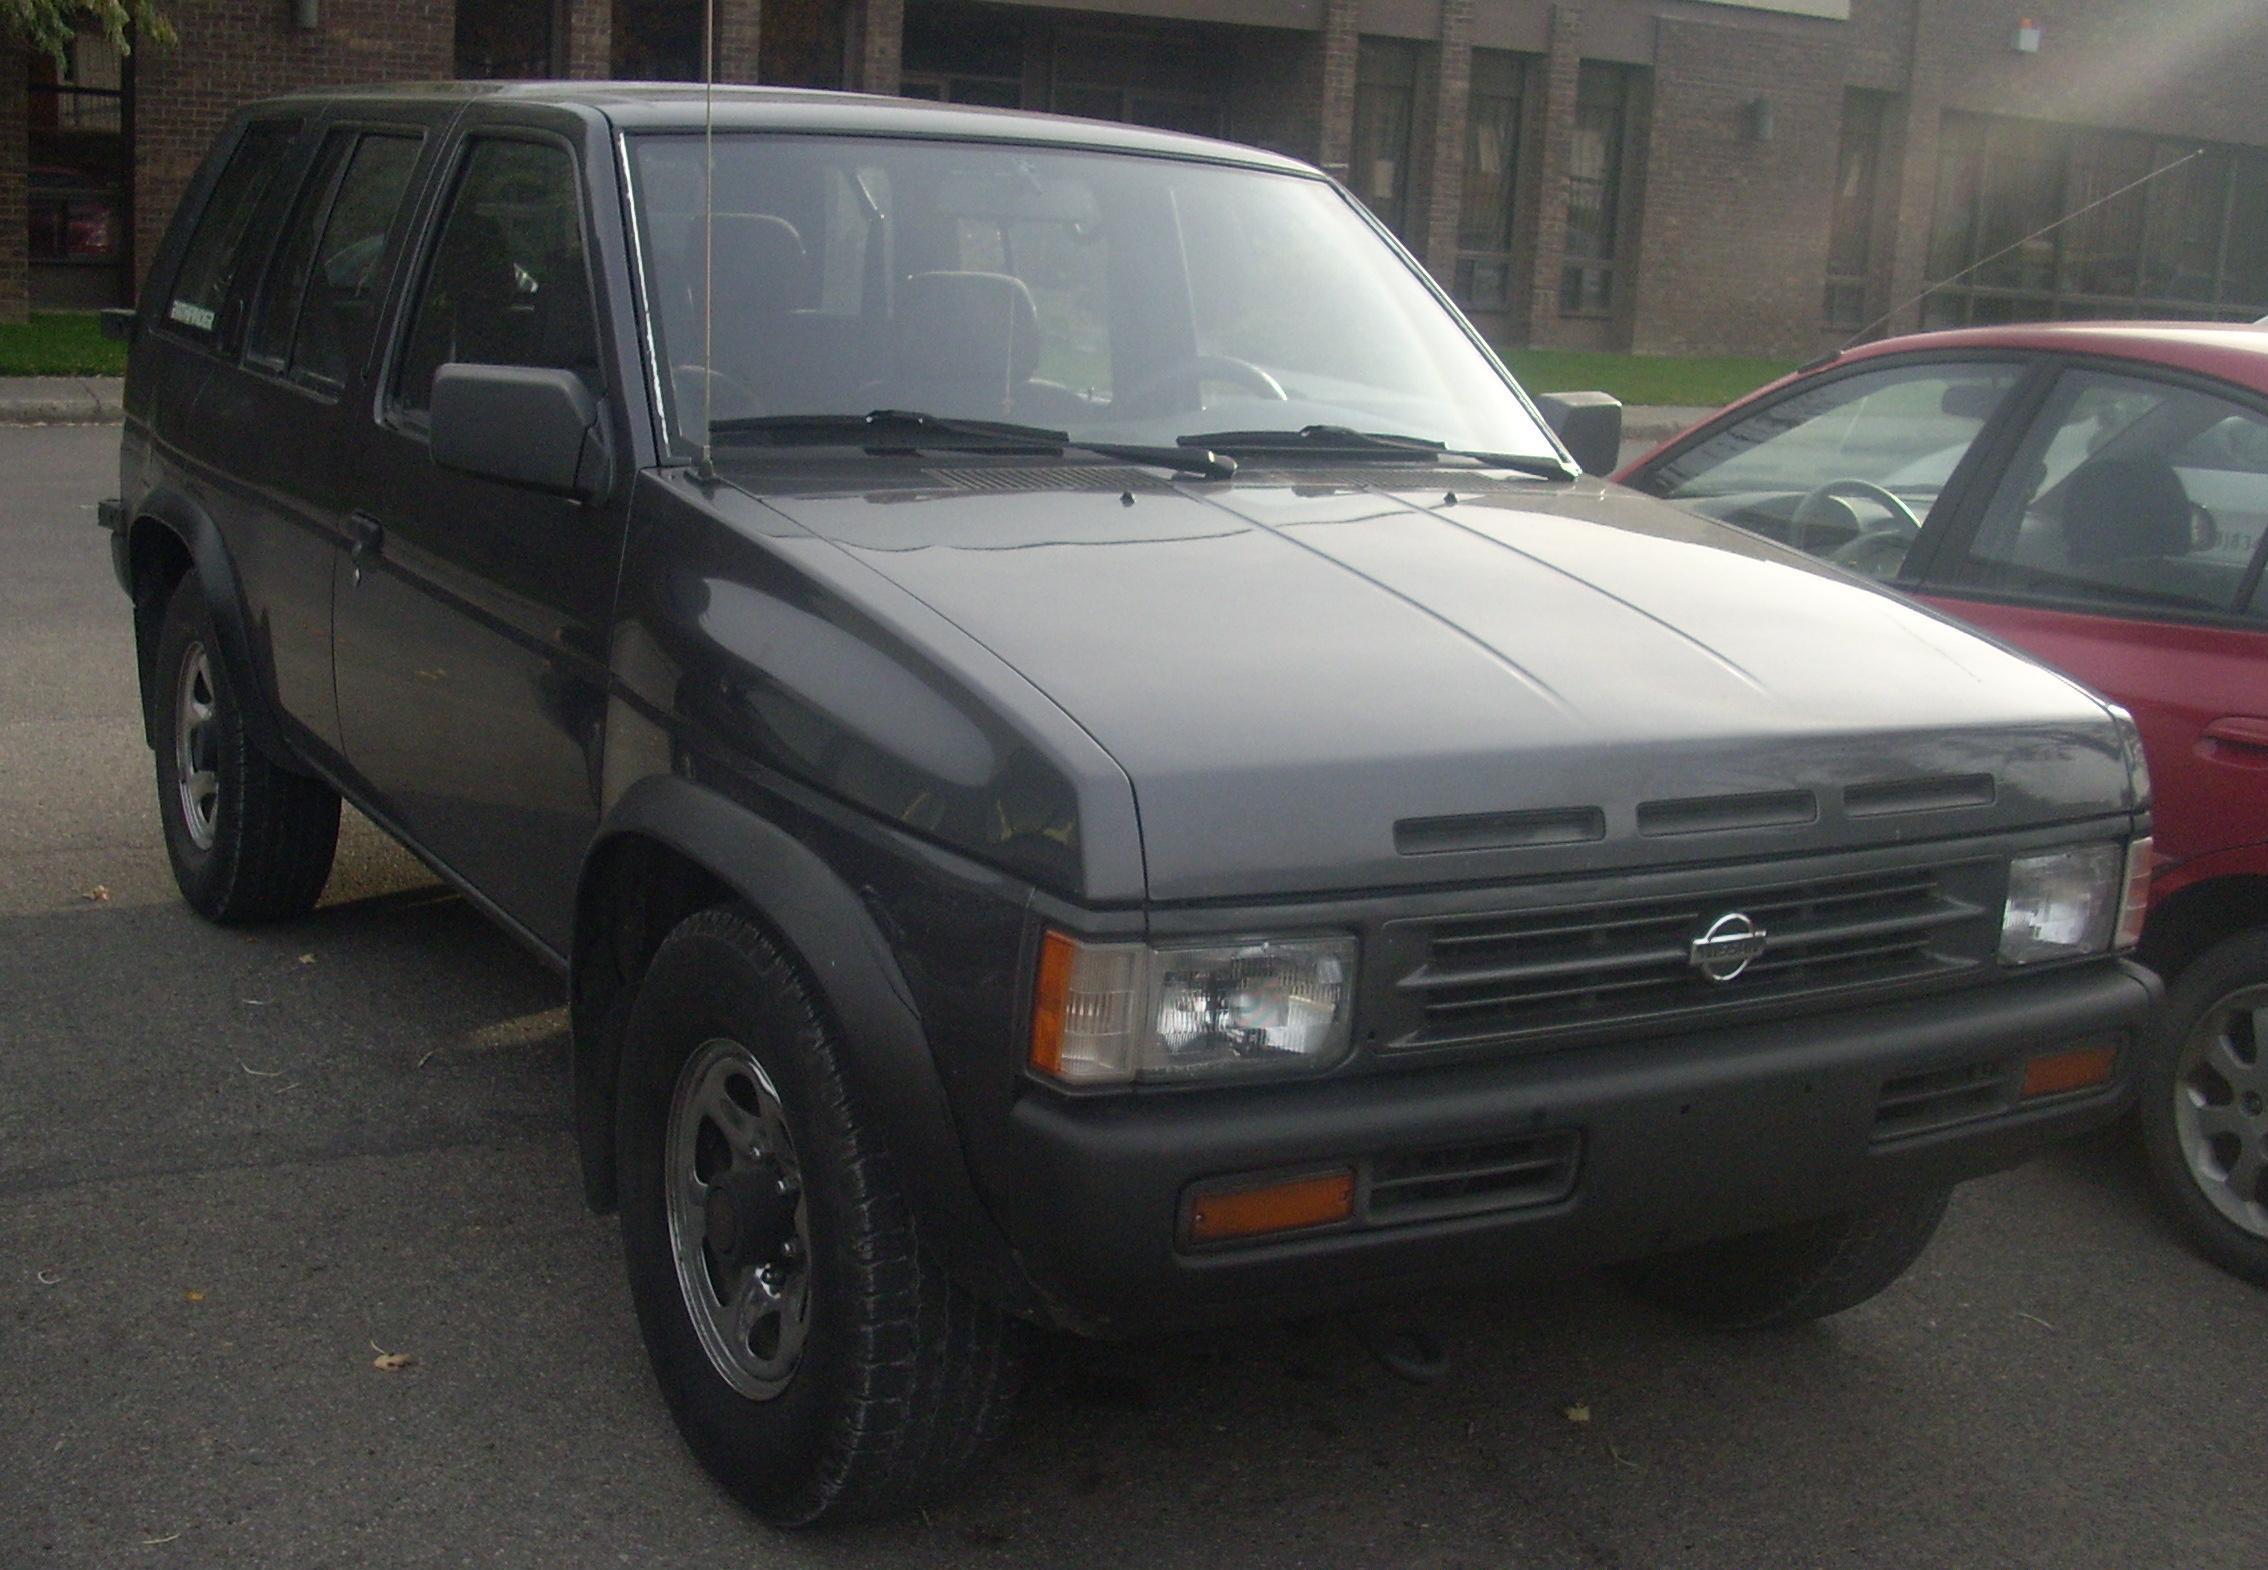 File:Nissan Pathfinder '93-'95.JPG - Wikimedia Commons